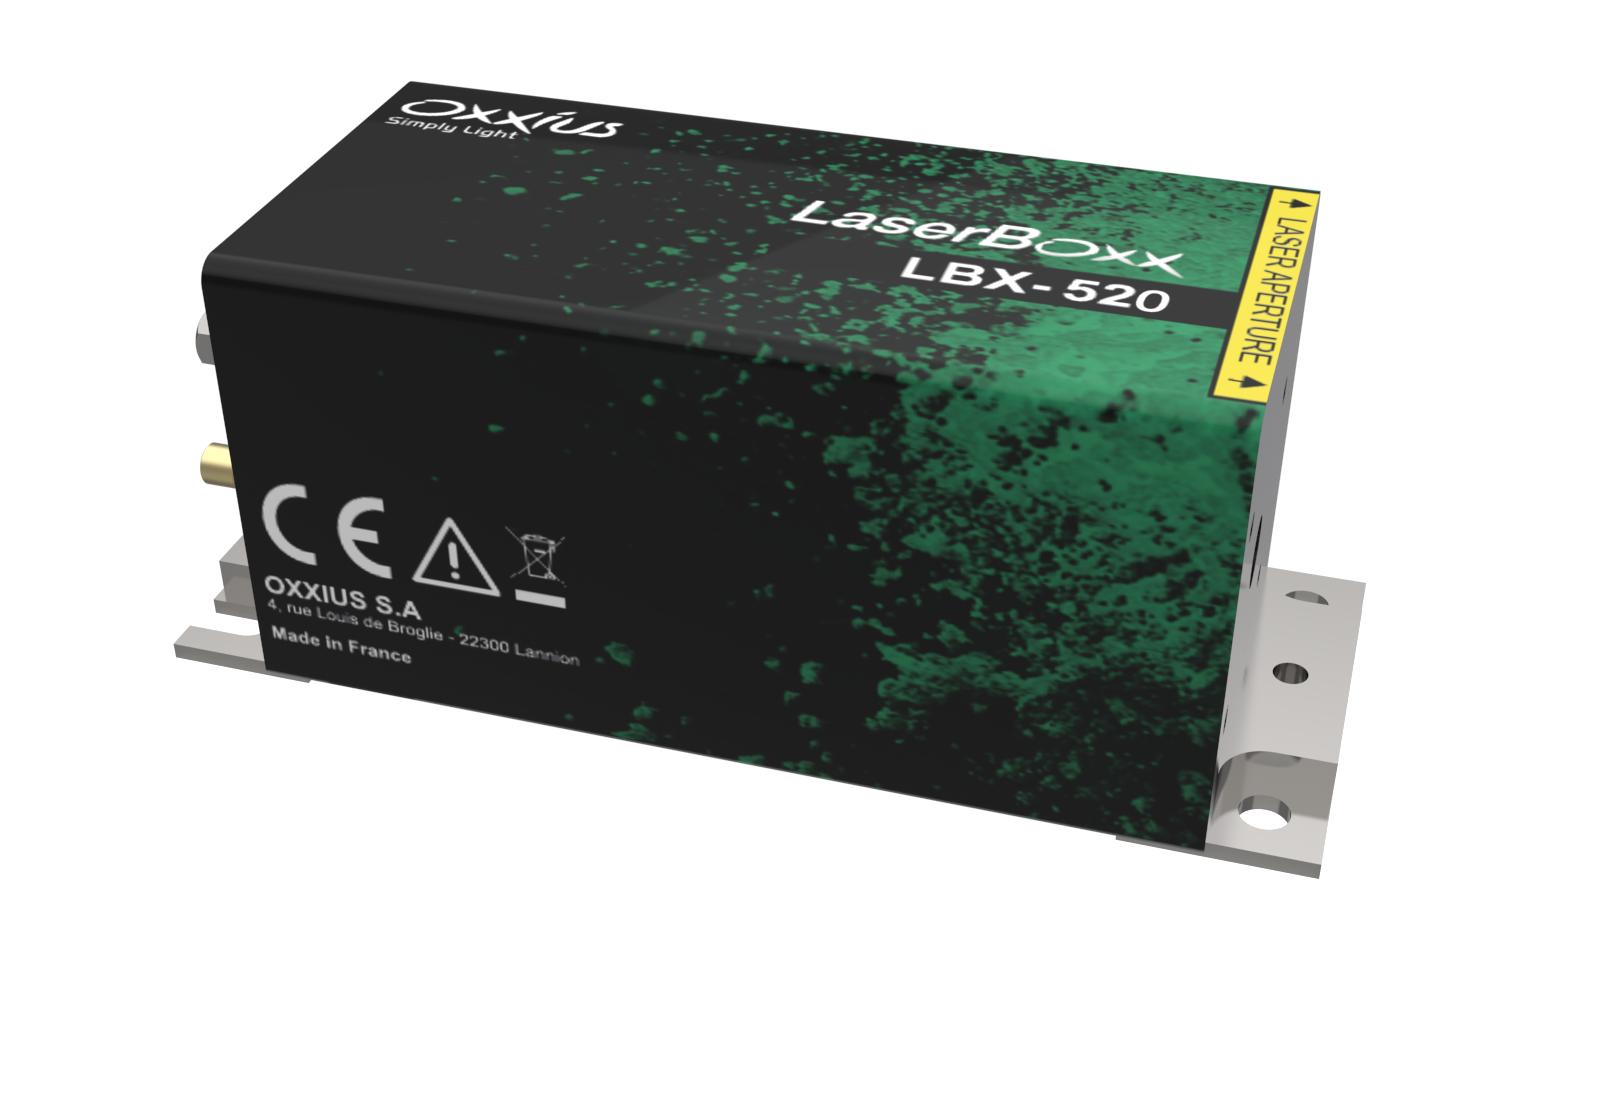 LBX-520-40-CSB